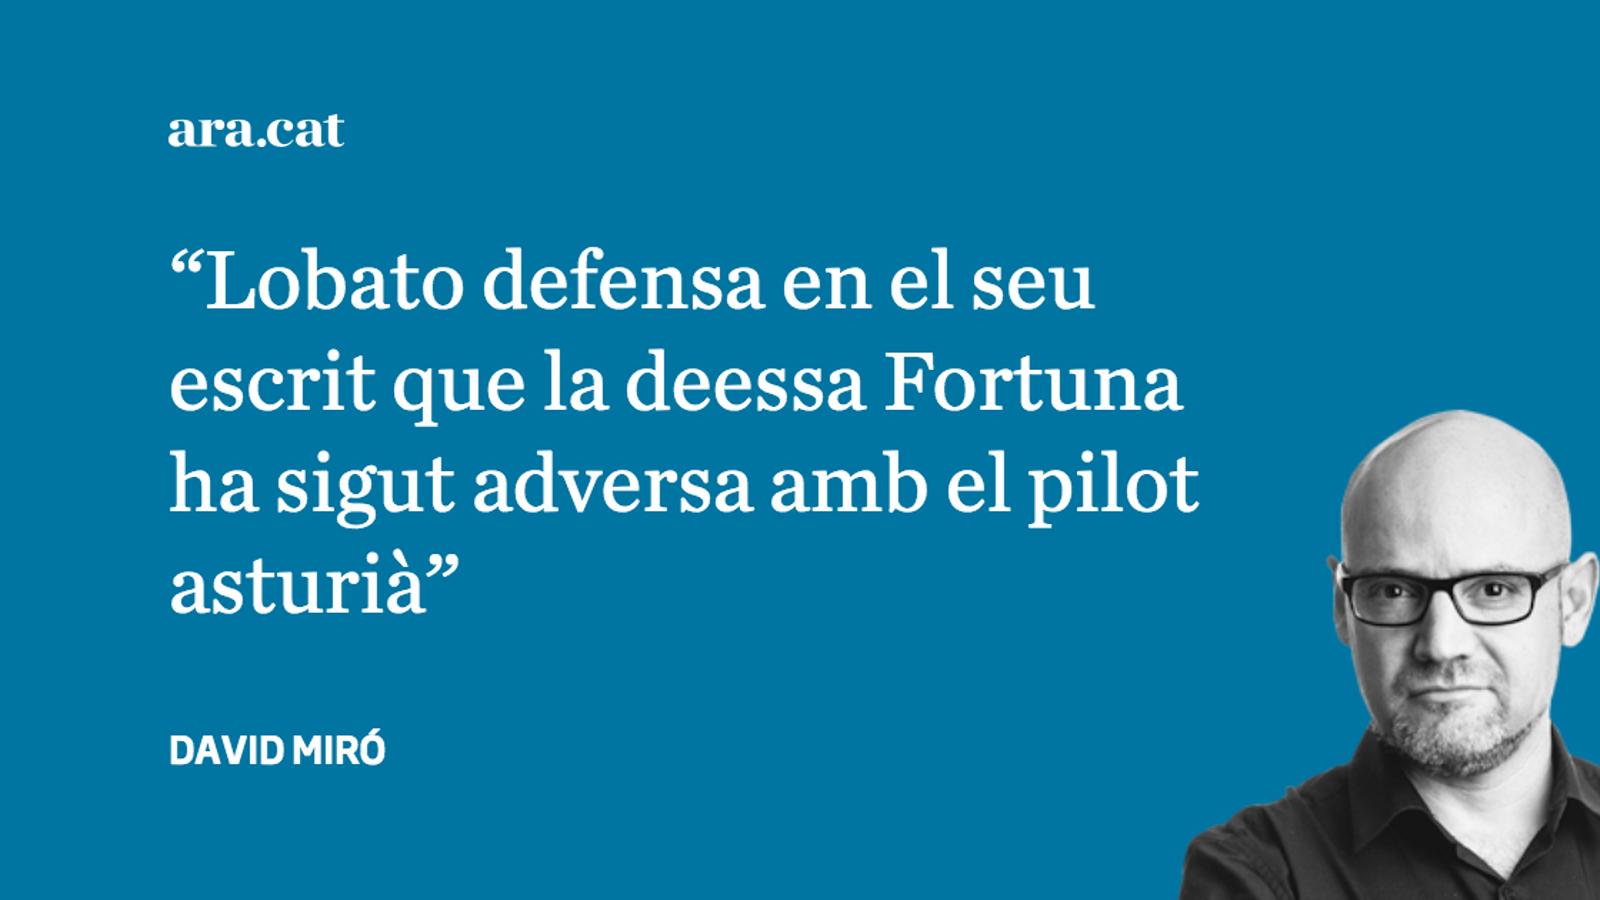 Les llàgrimes d'Antonio Lobato per Fernando Alonso